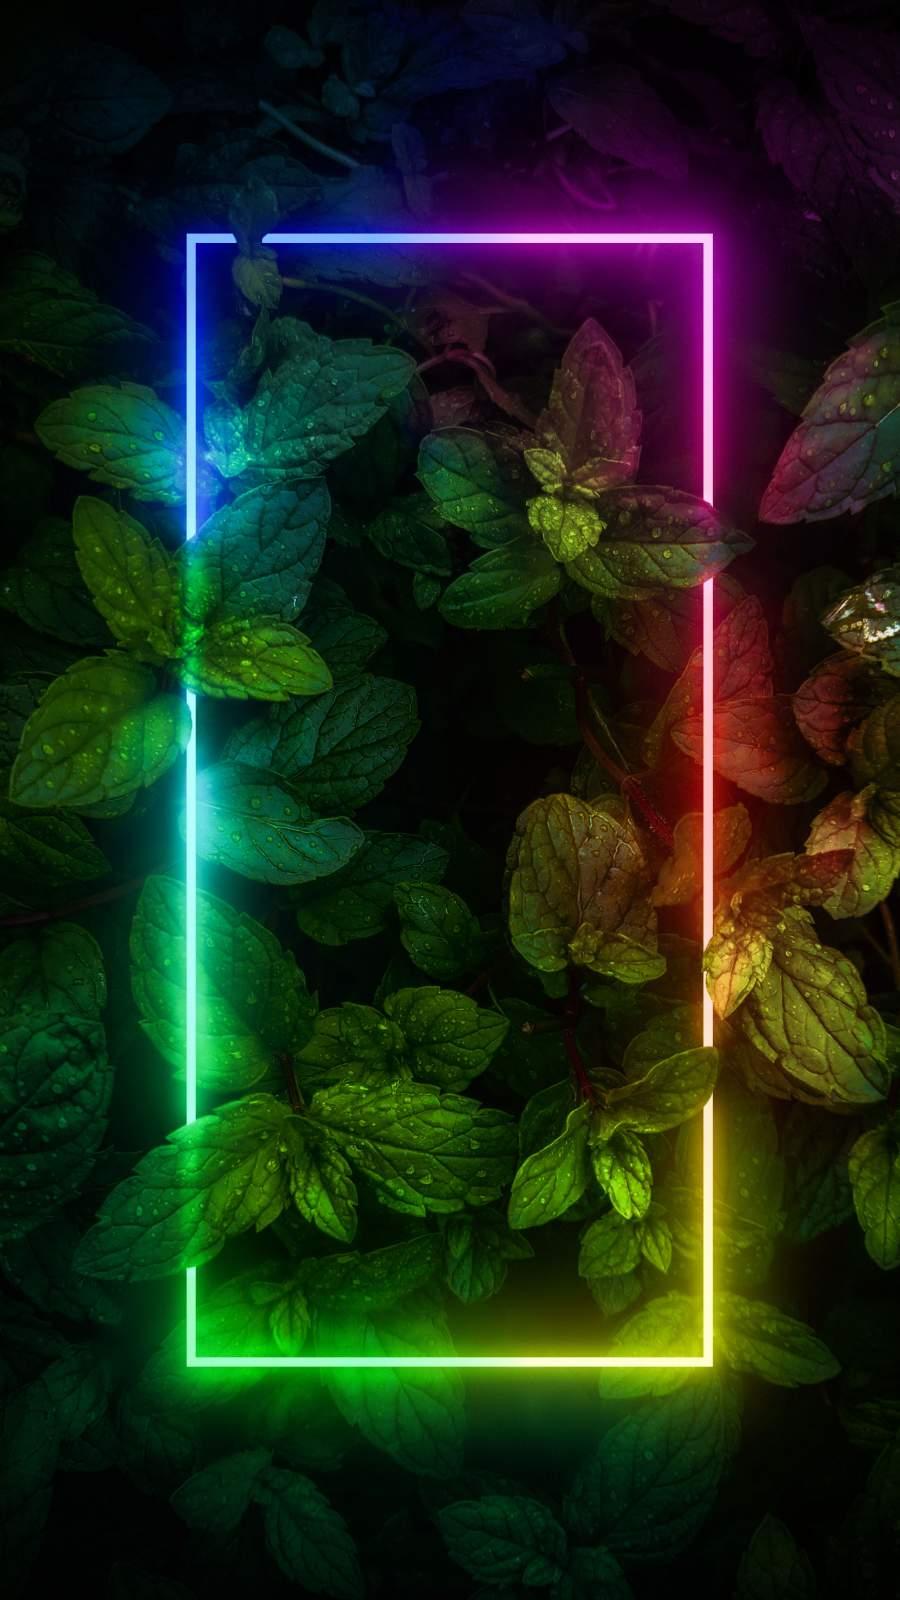 Neon RGB Glow Foliage Nature